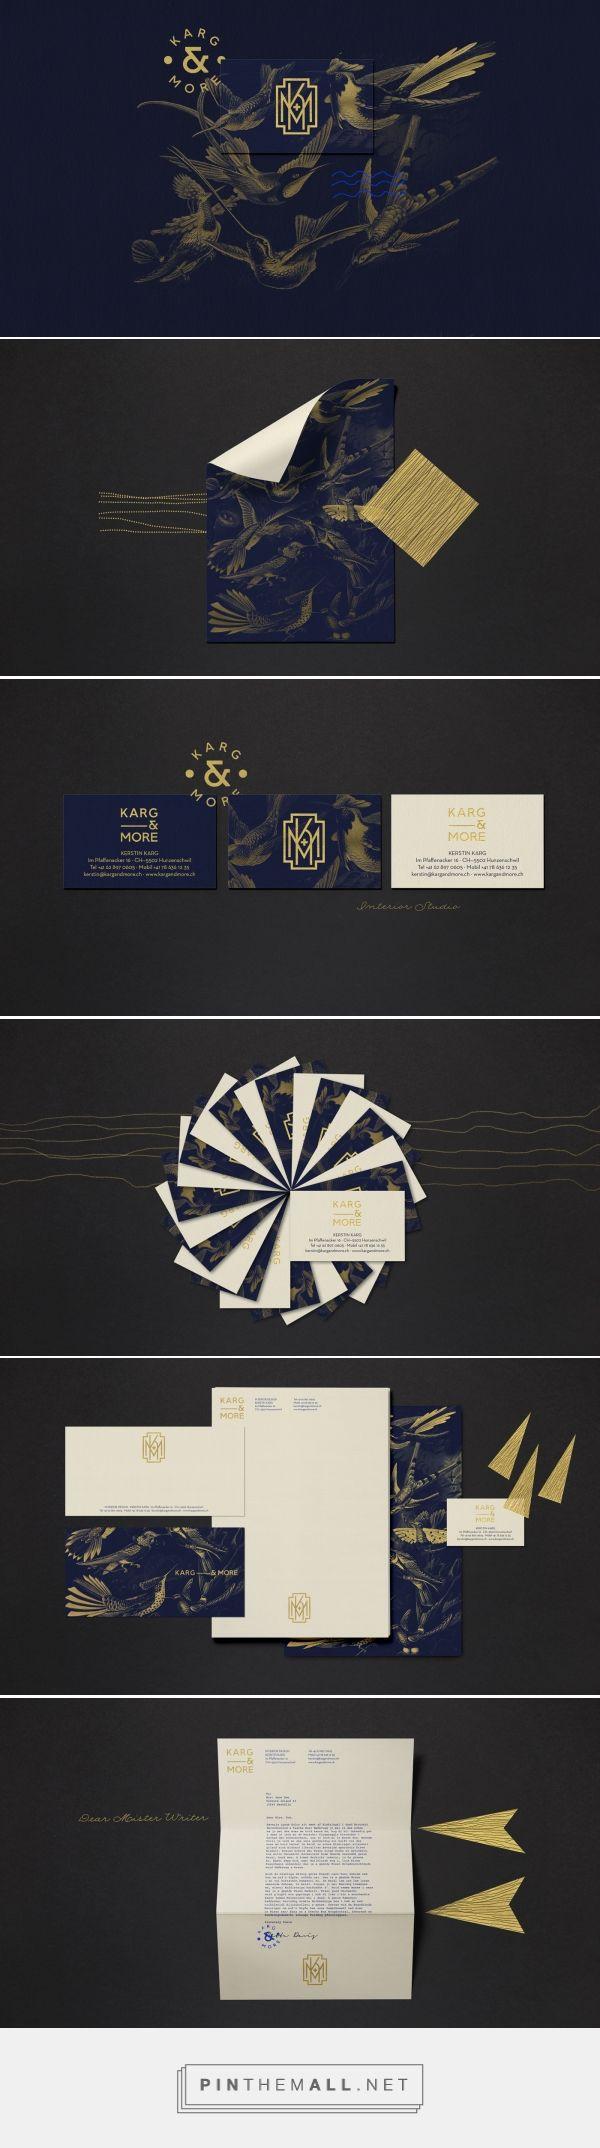 Karg & More Interior Studio Branding by Wir Sind Schoener | Fivestar Branding Agency – Design and Branding Agency & Curated Inspiration Gallery